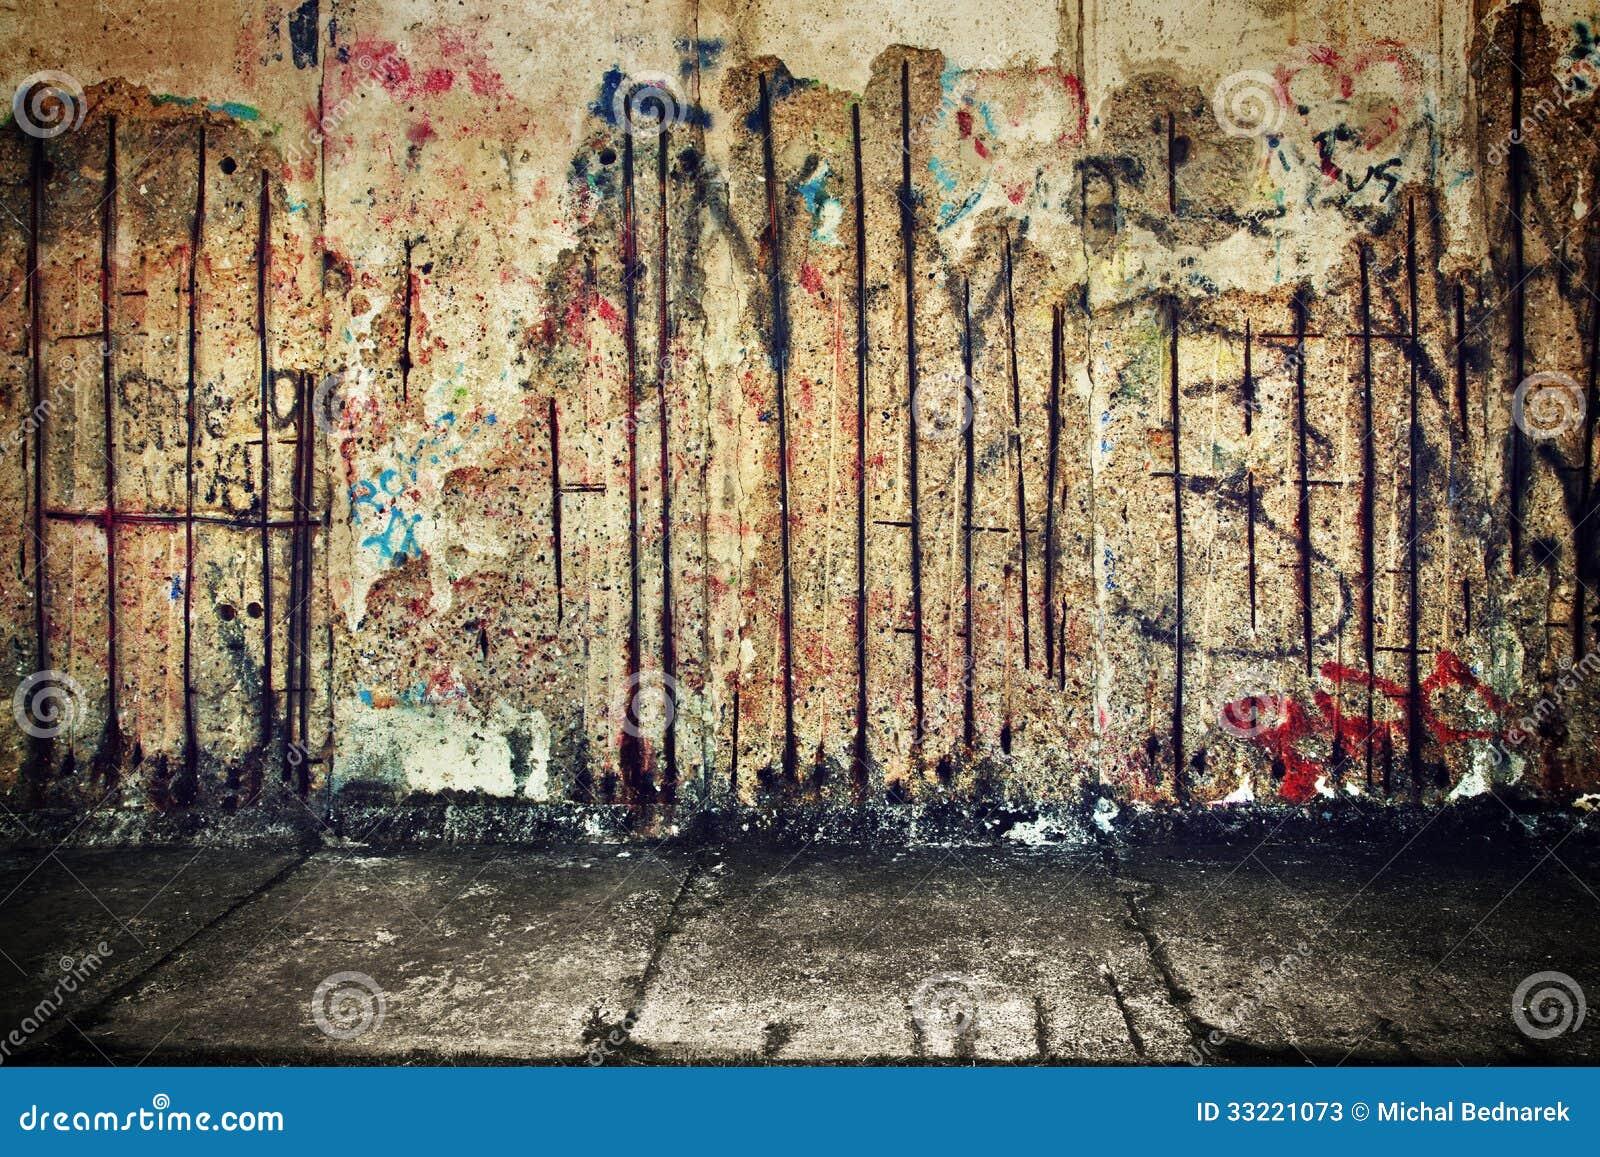 Cement Wall Graffiti : Grunge rusty concrete wall with random graffiti stock